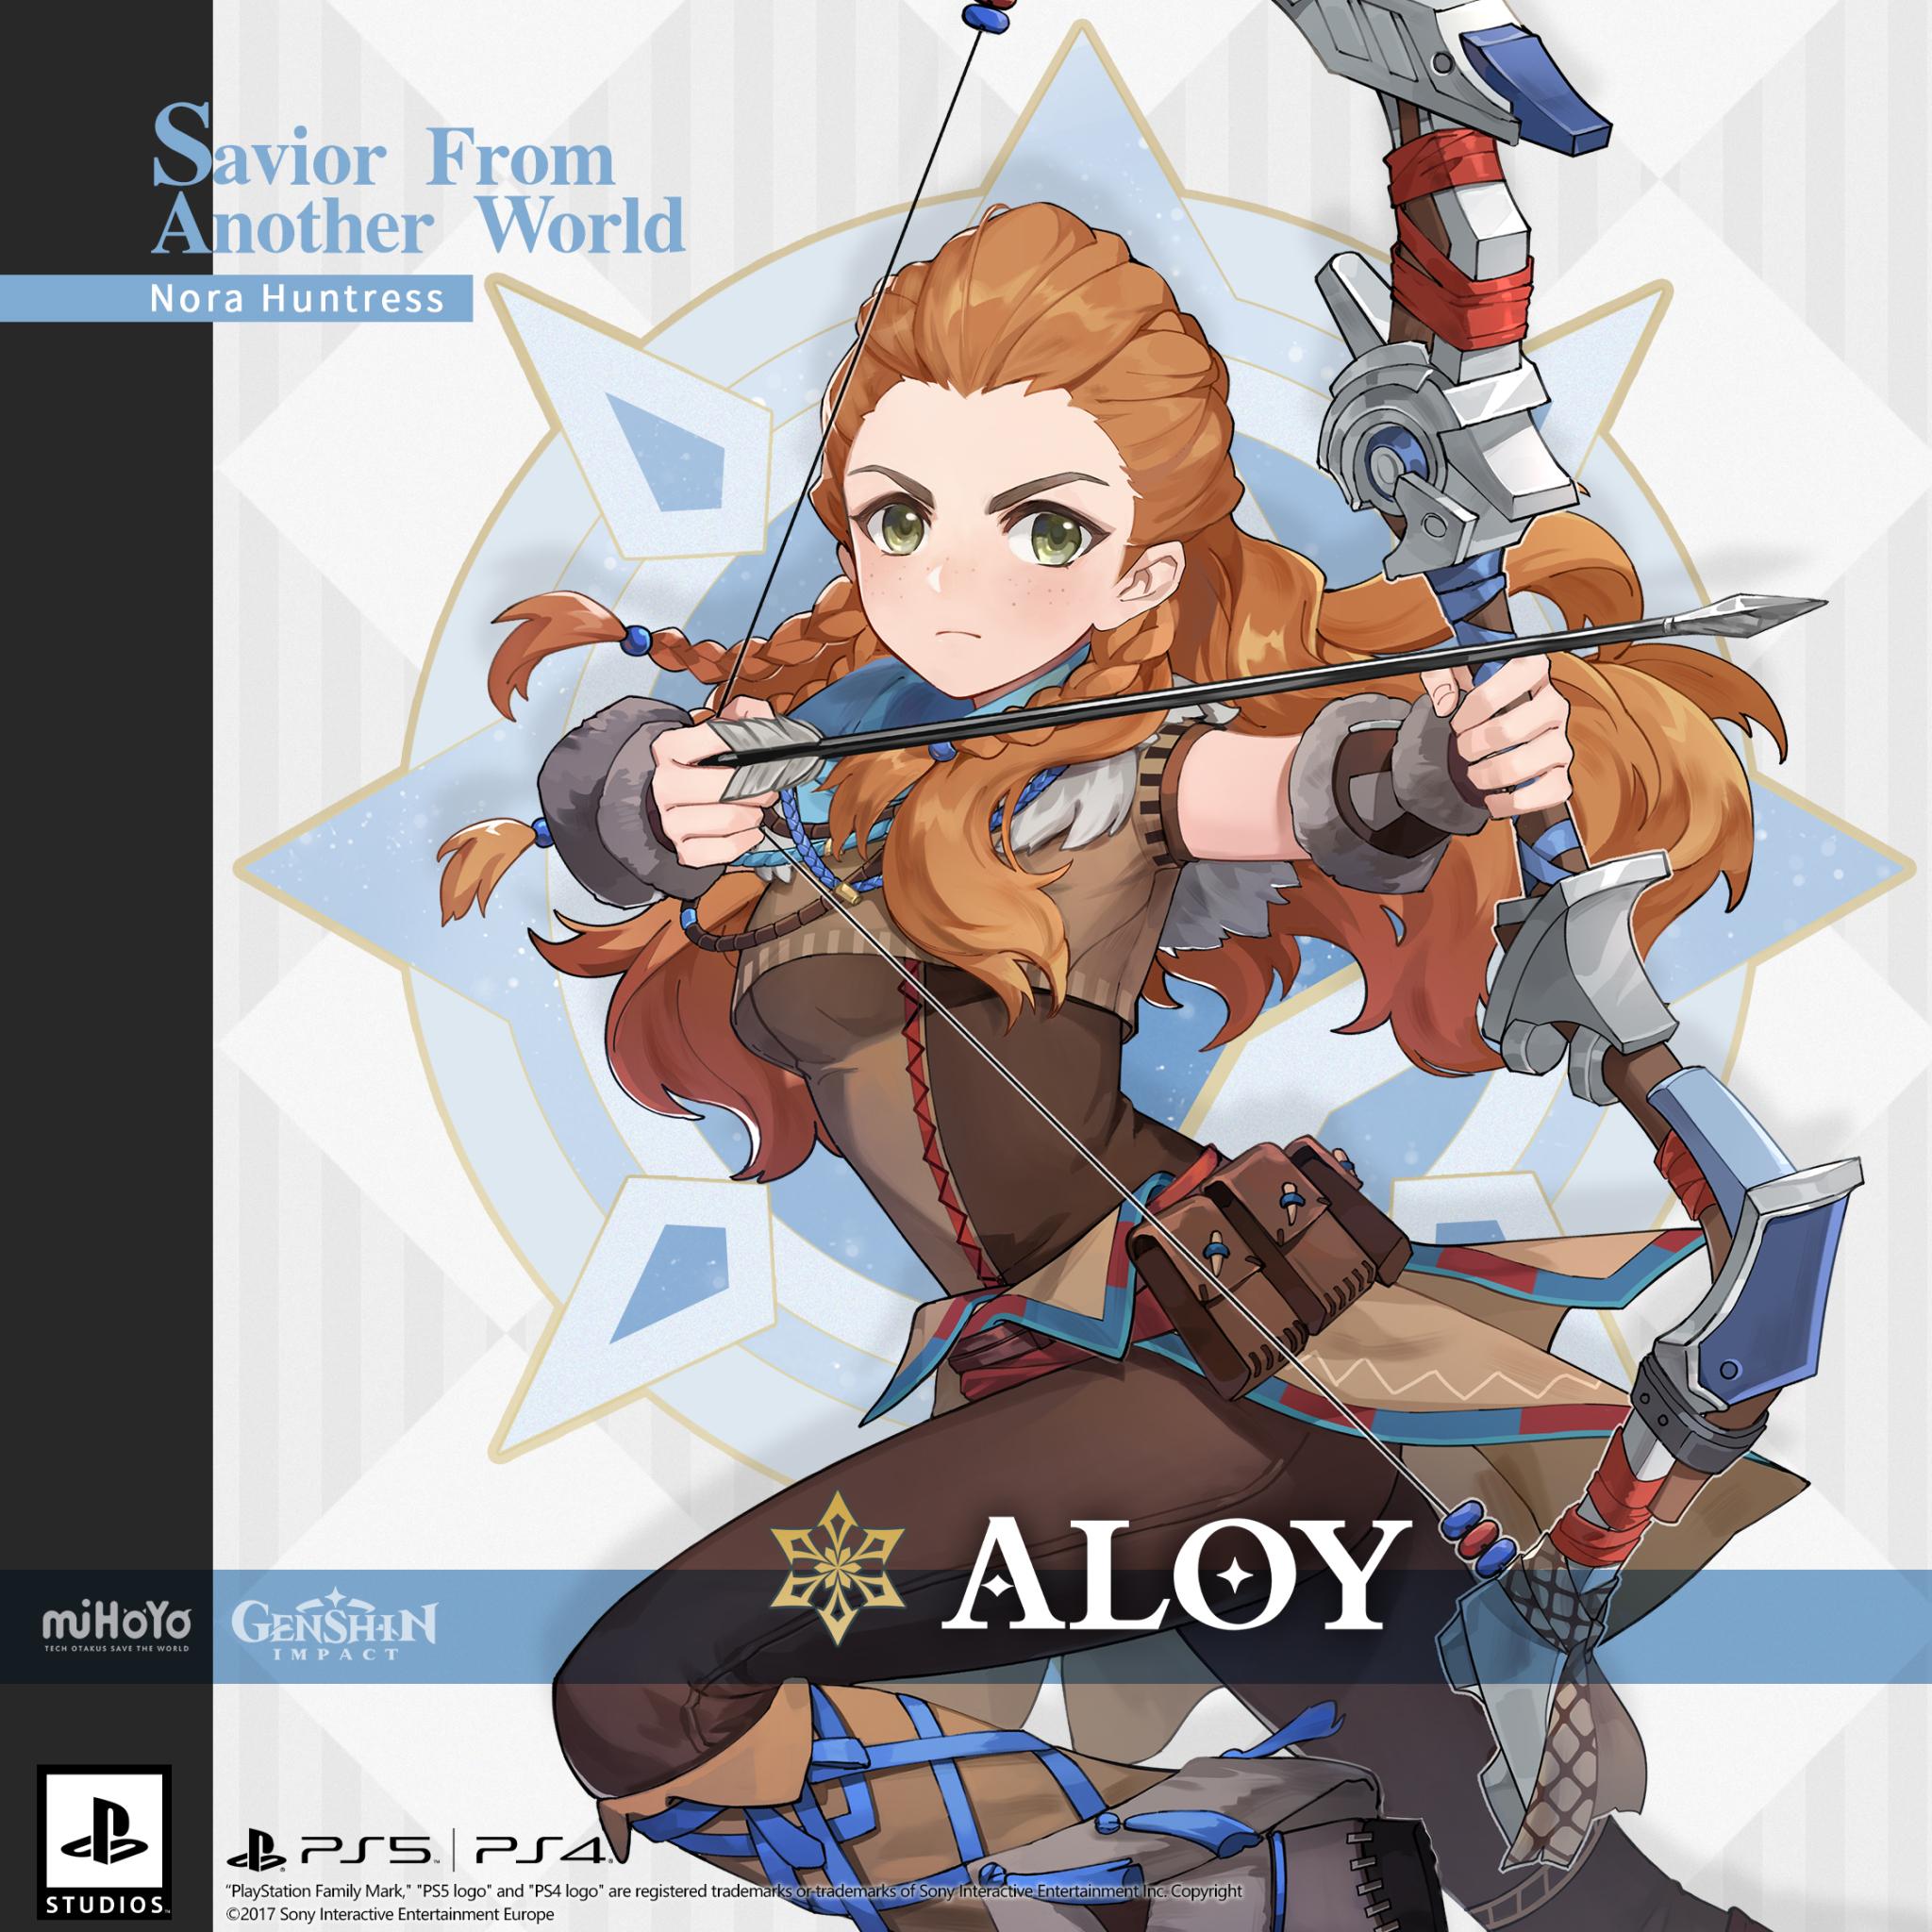 Aloy from Horizon Zero Dawn for Free at Genshin Impact